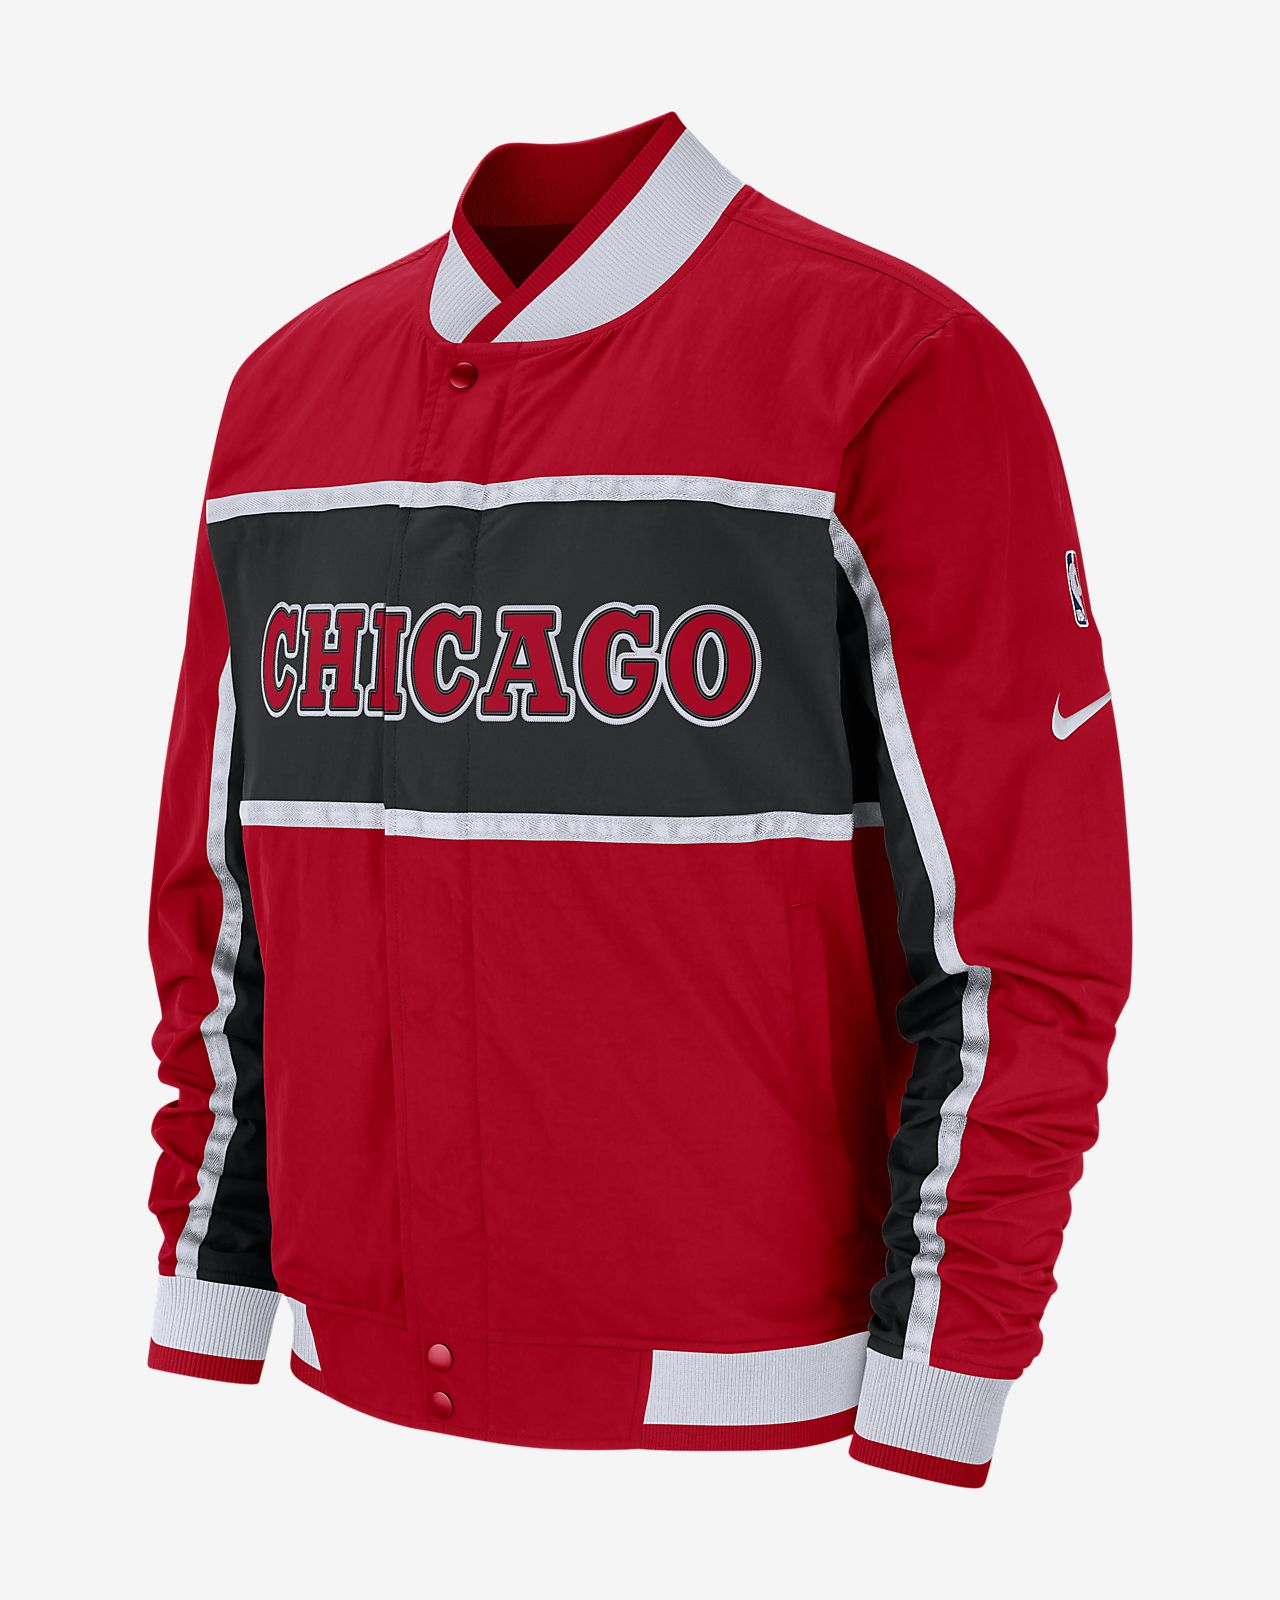 Chicago Bulls Nike Courtside NBA-s férfikabát